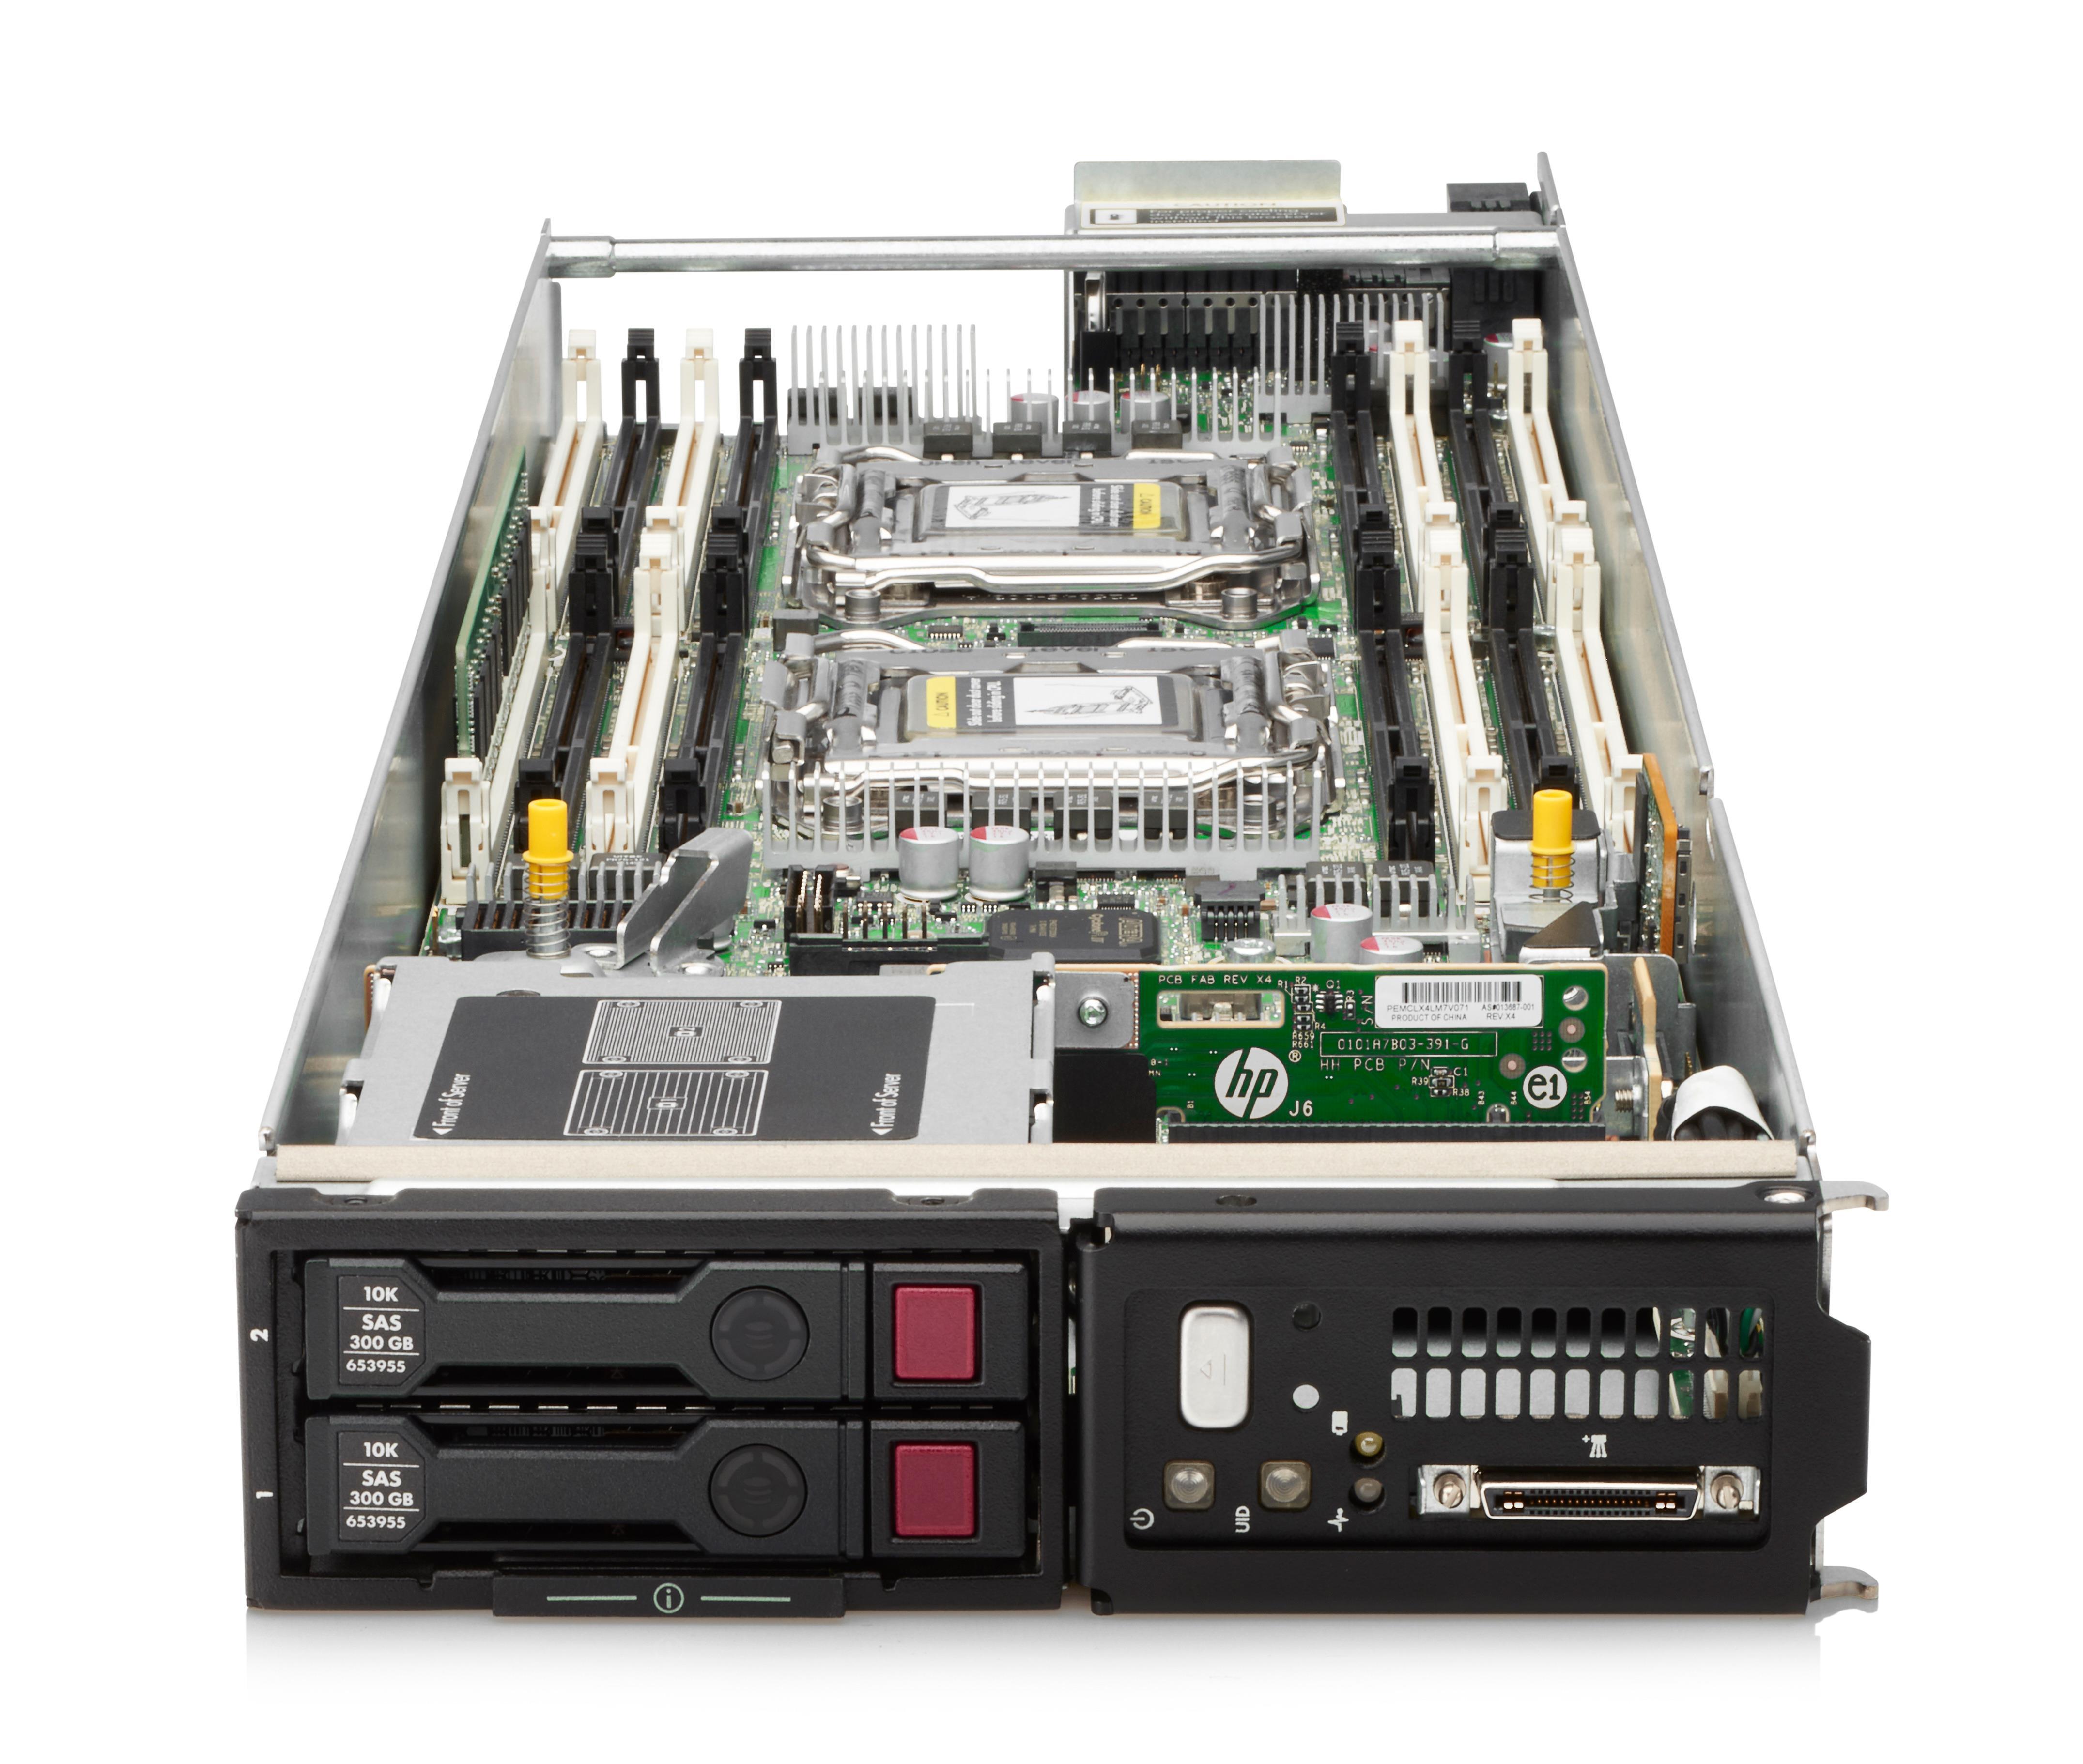 HP ProLiant XL450 Gen9 Configure-to-order Server